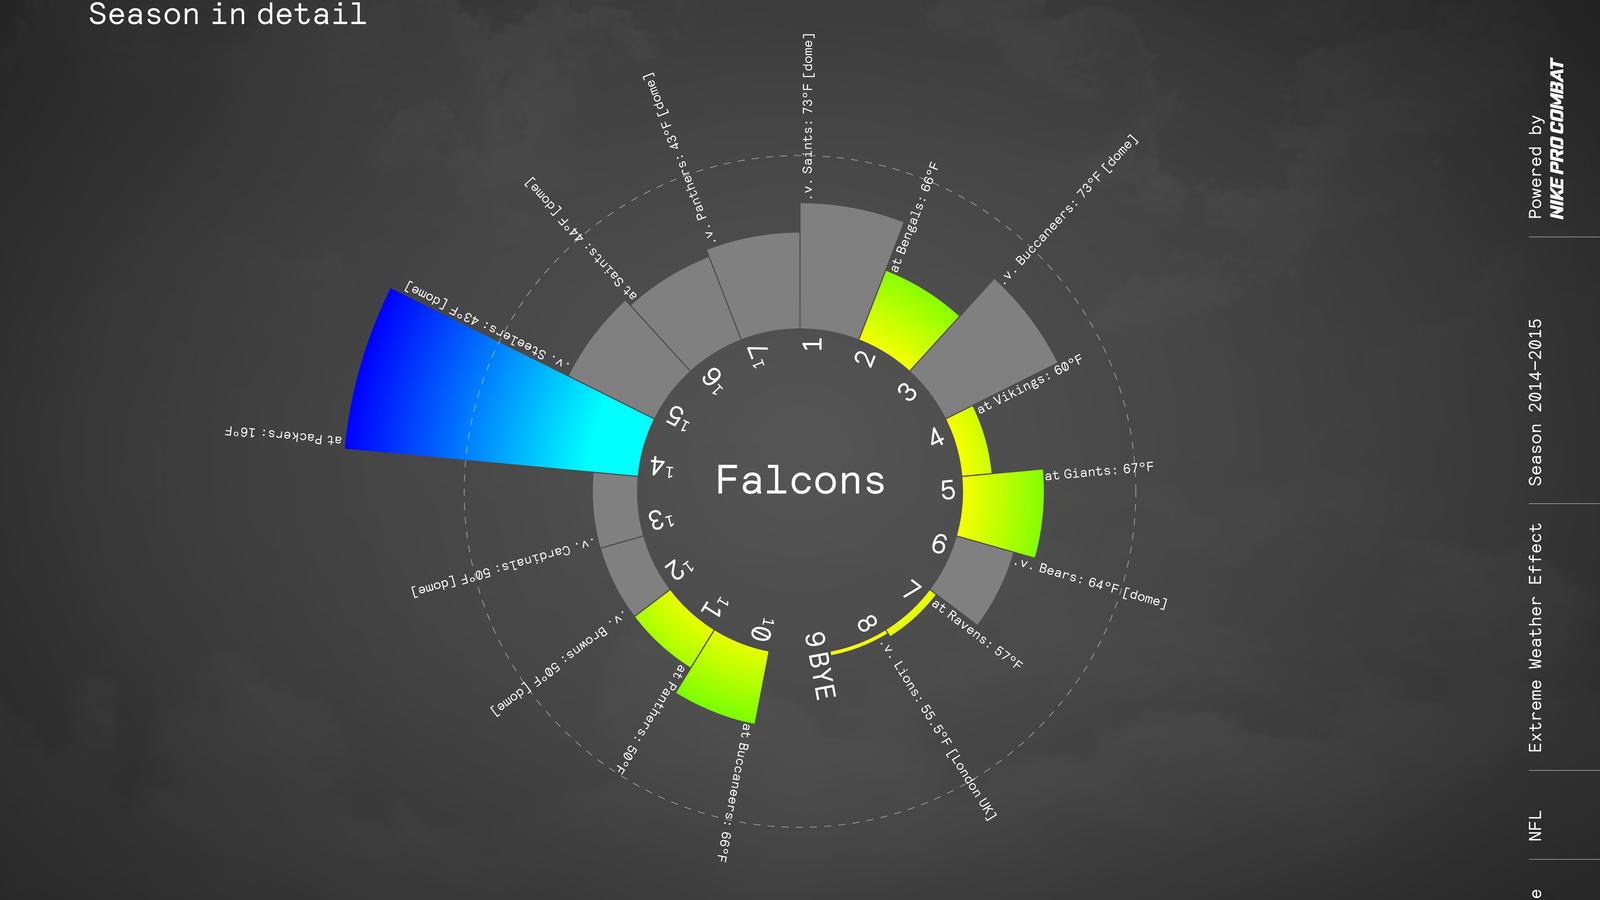 Nike Nfl Pro Combat Weather Sos Falcons